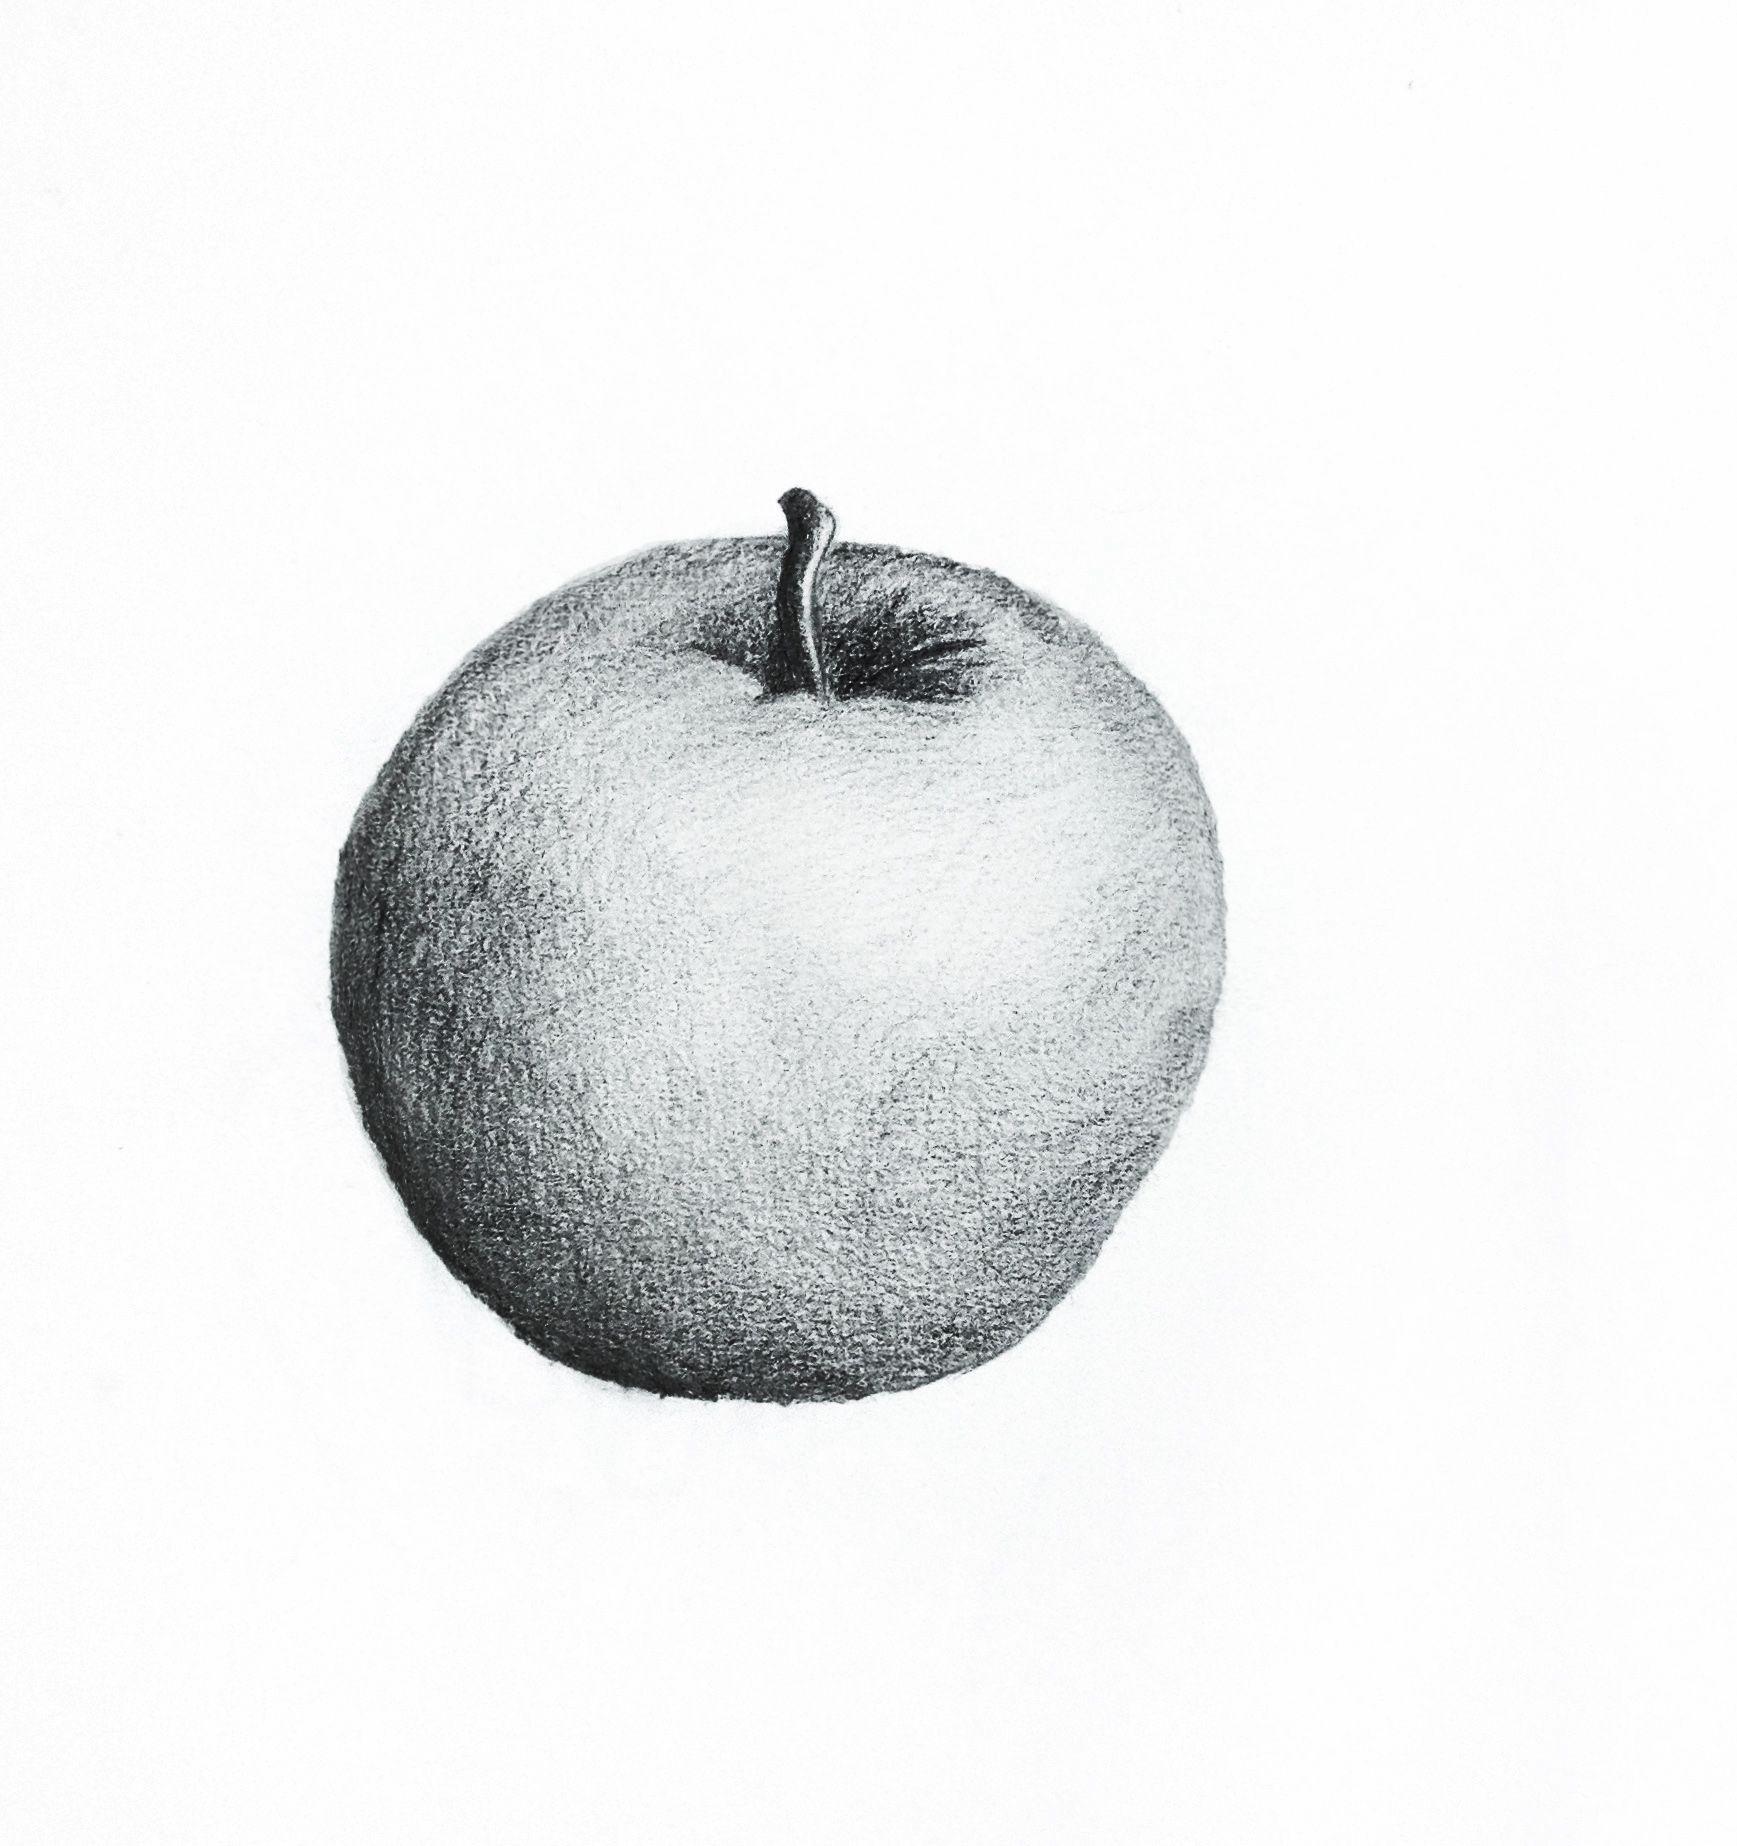 Apple pencil sketch by liron simon